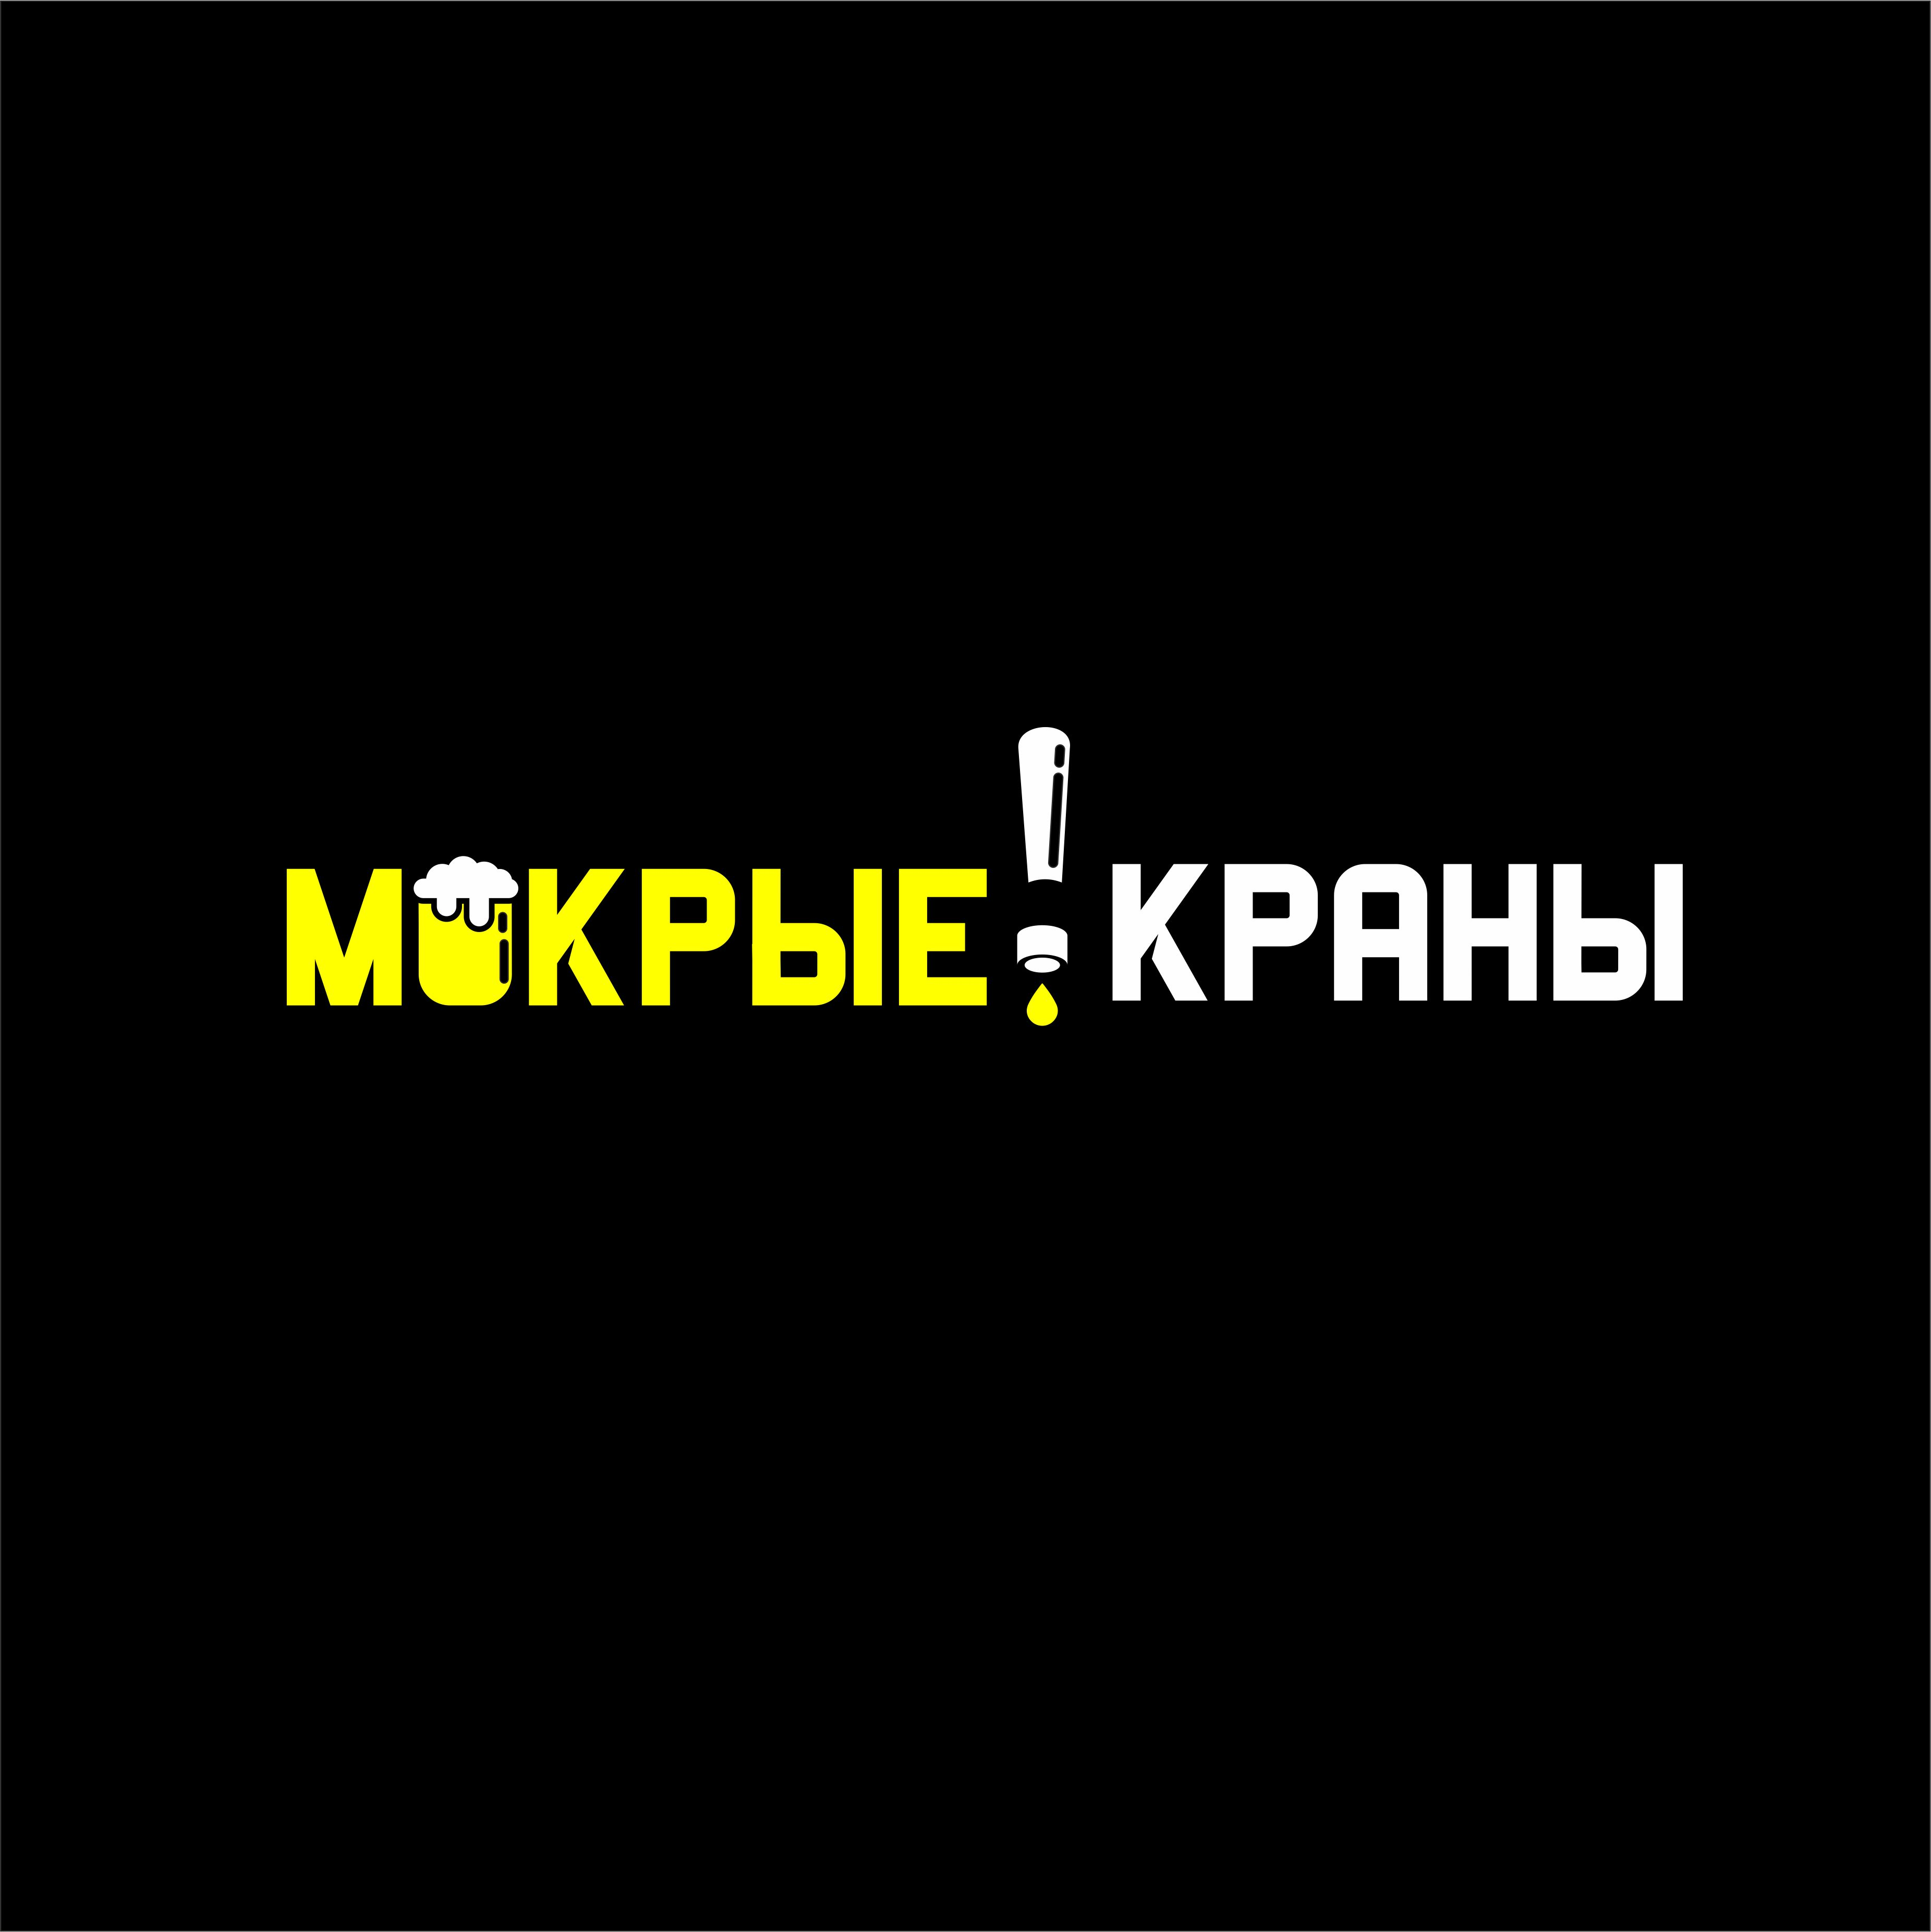 Вывеска/логотип для пивного магазина фото f_067601ec5ae9b265.jpg